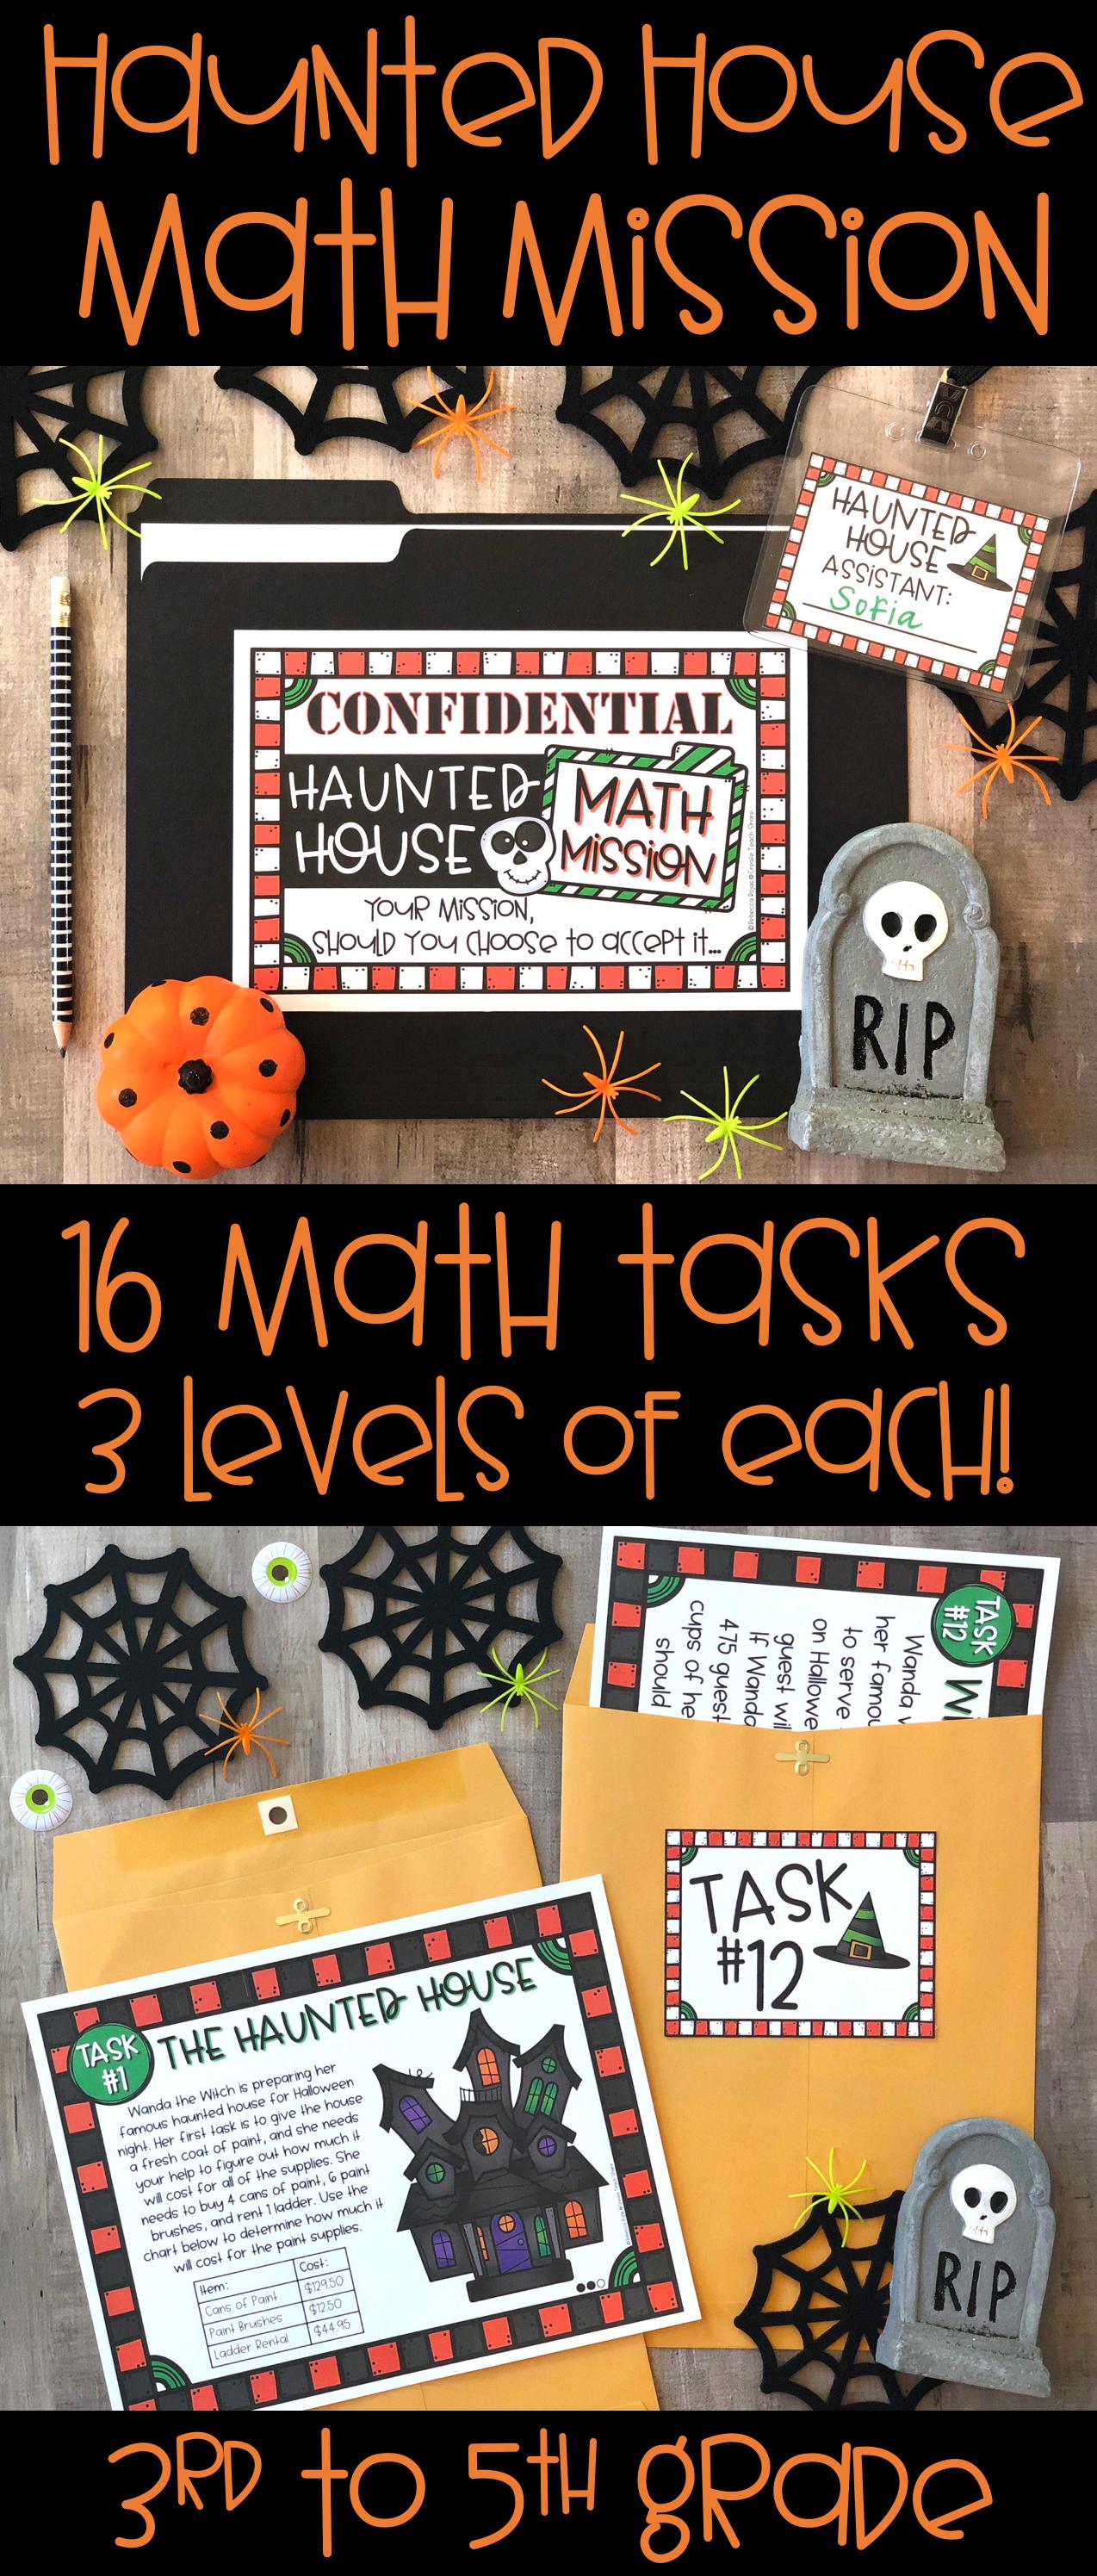 Halloween Math Mission Haunted House